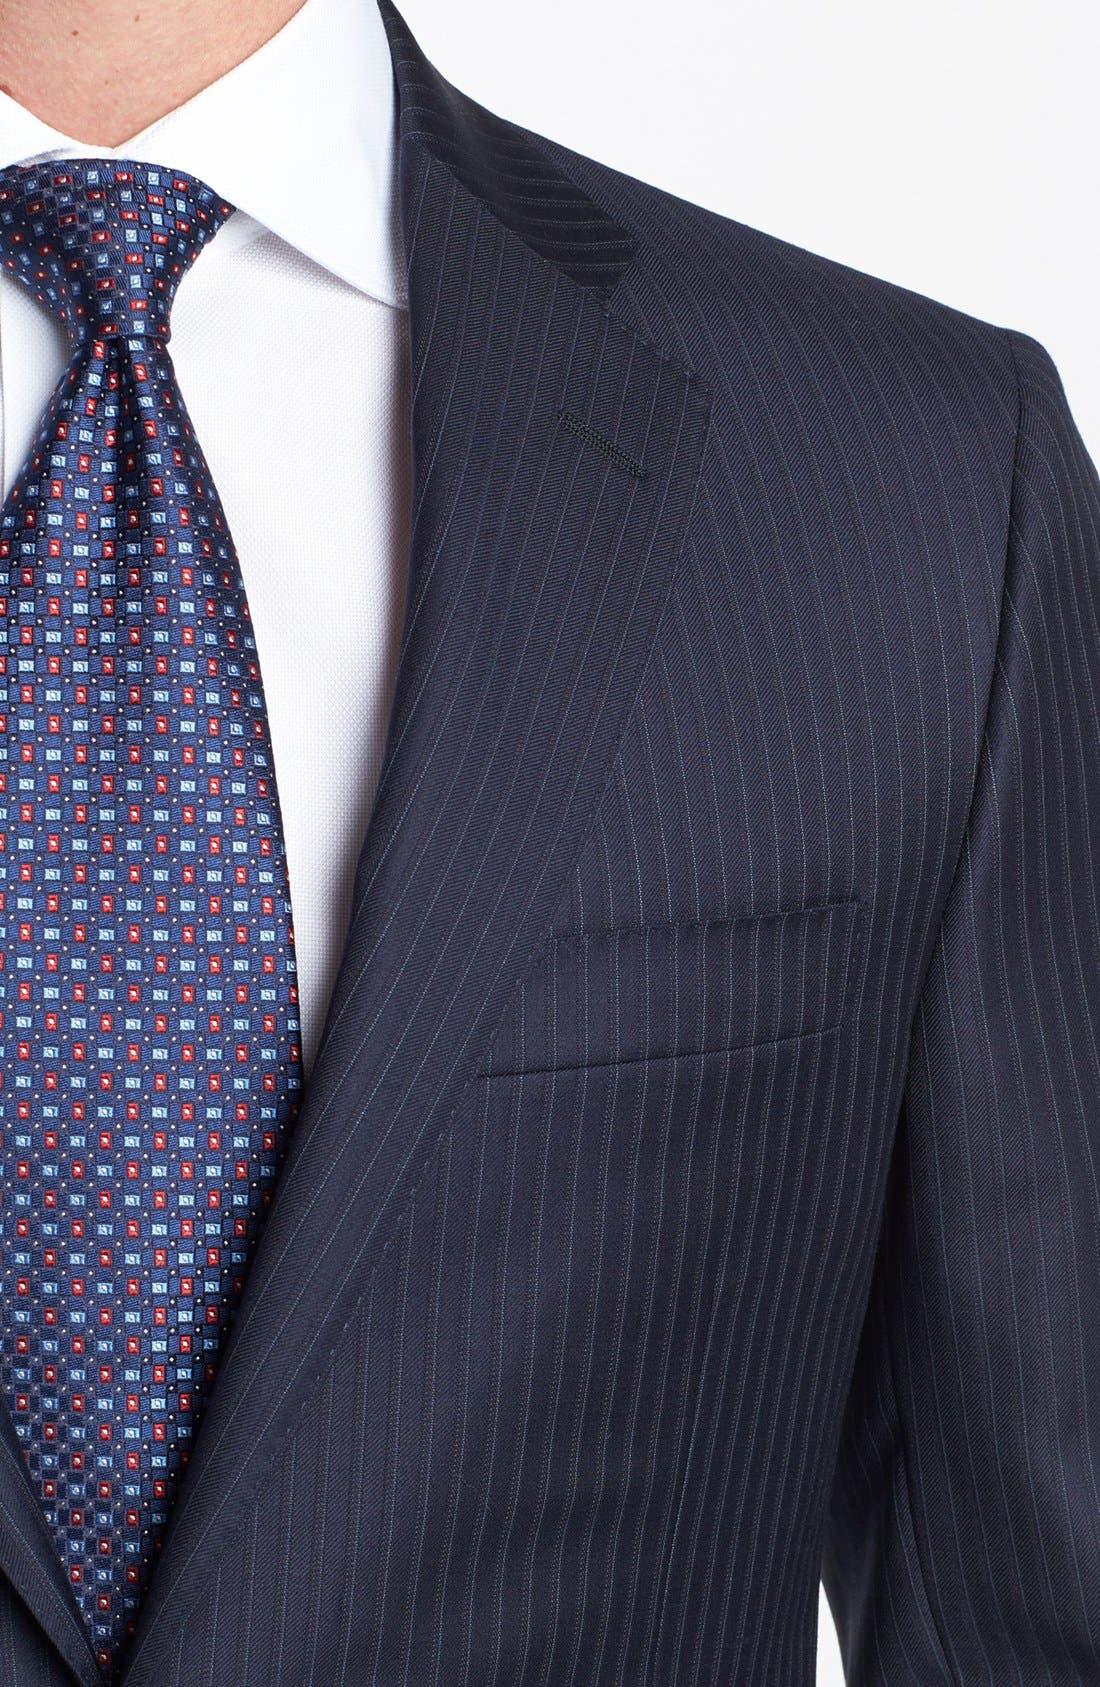 Alternate Image 2  - Hickey Freeman 'B Series' Classic Fit Stripe Suit